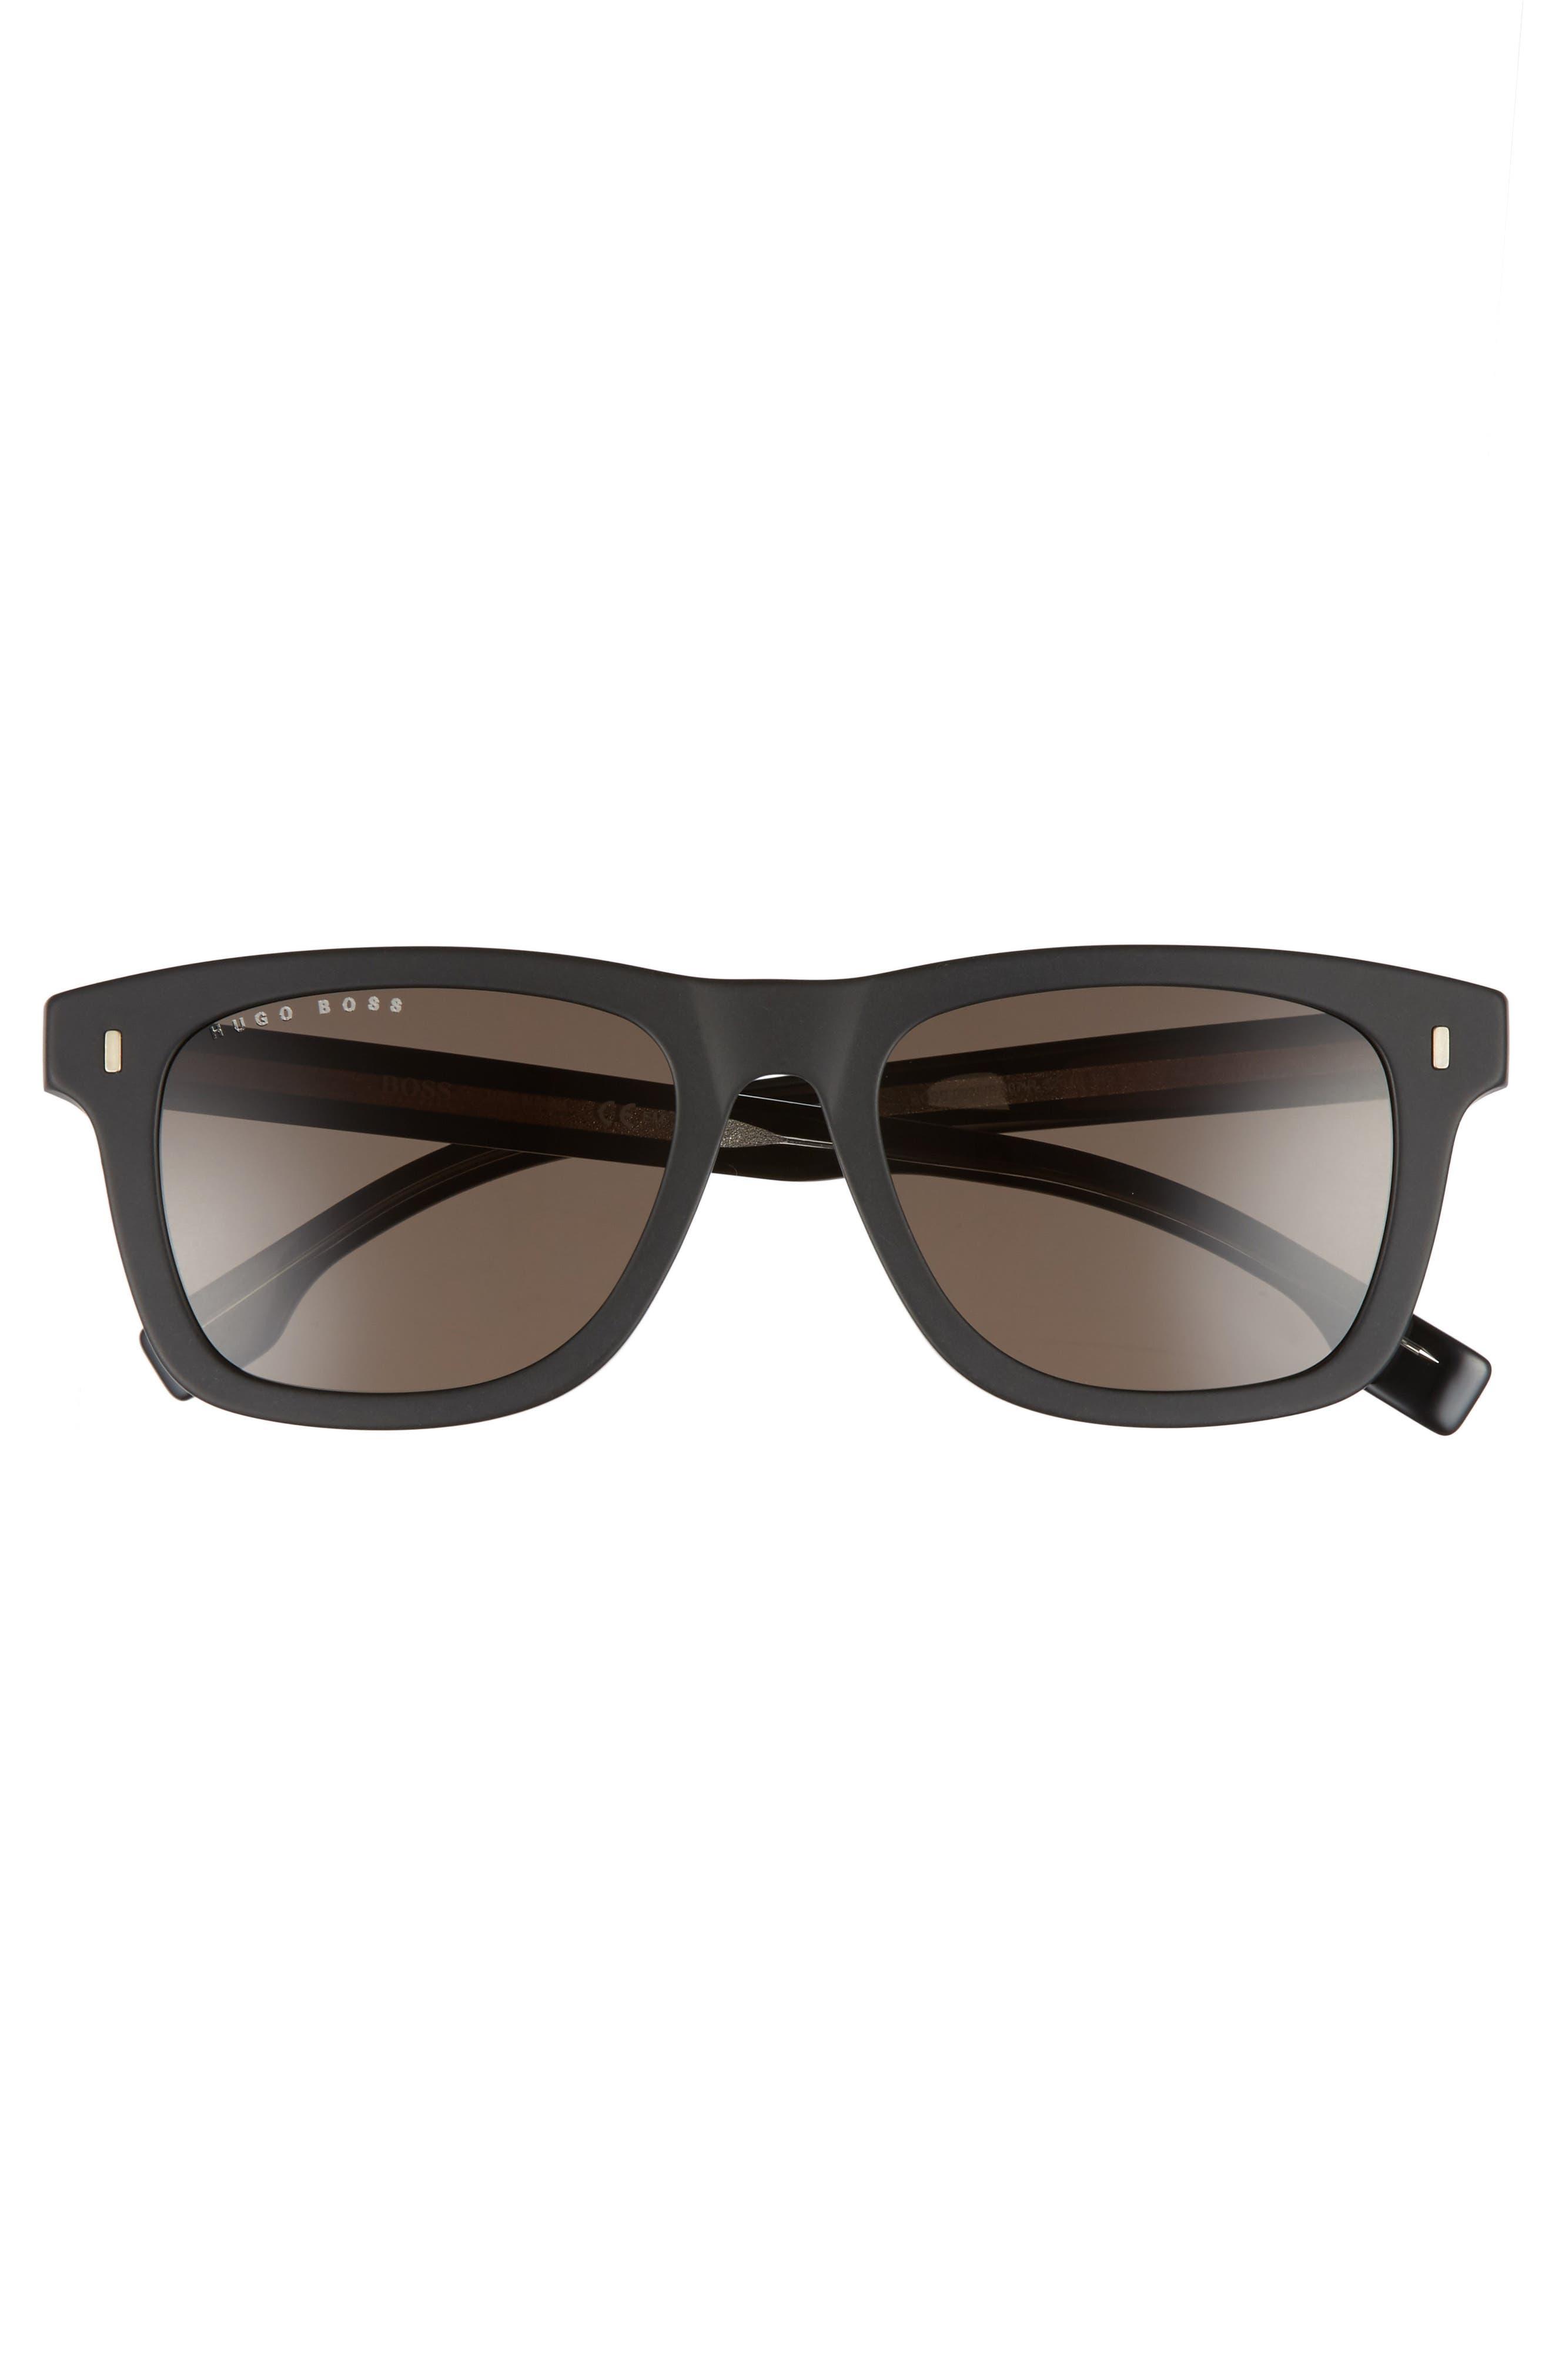 52mm Sunglasses,                             Alternate thumbnail 3, color,